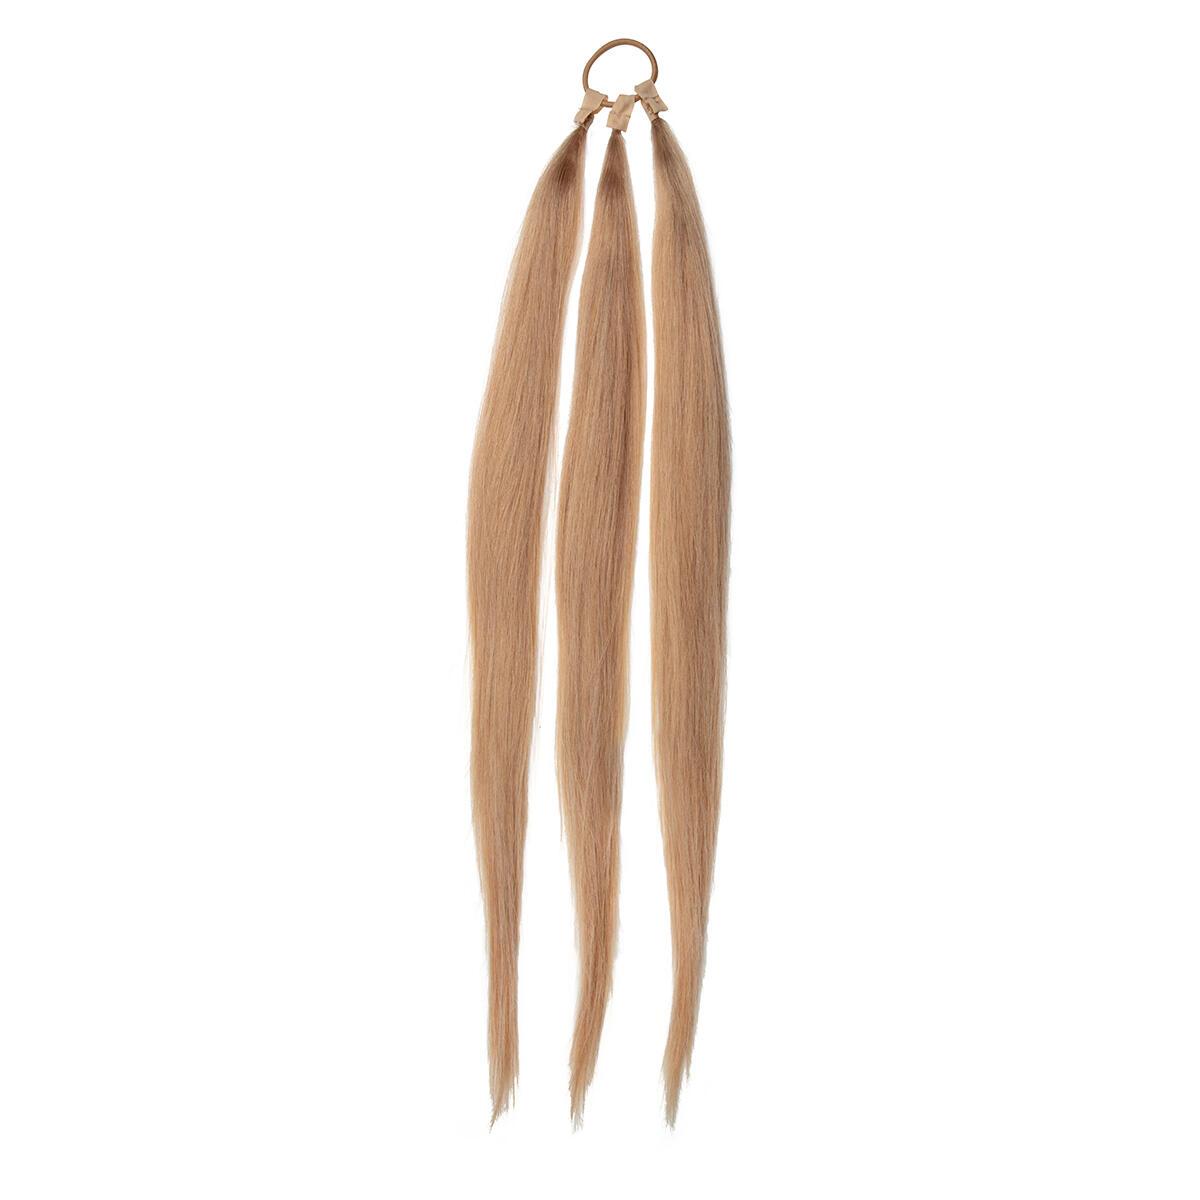 Easy Braid Original 7.5 Dark Blonde 55 cm